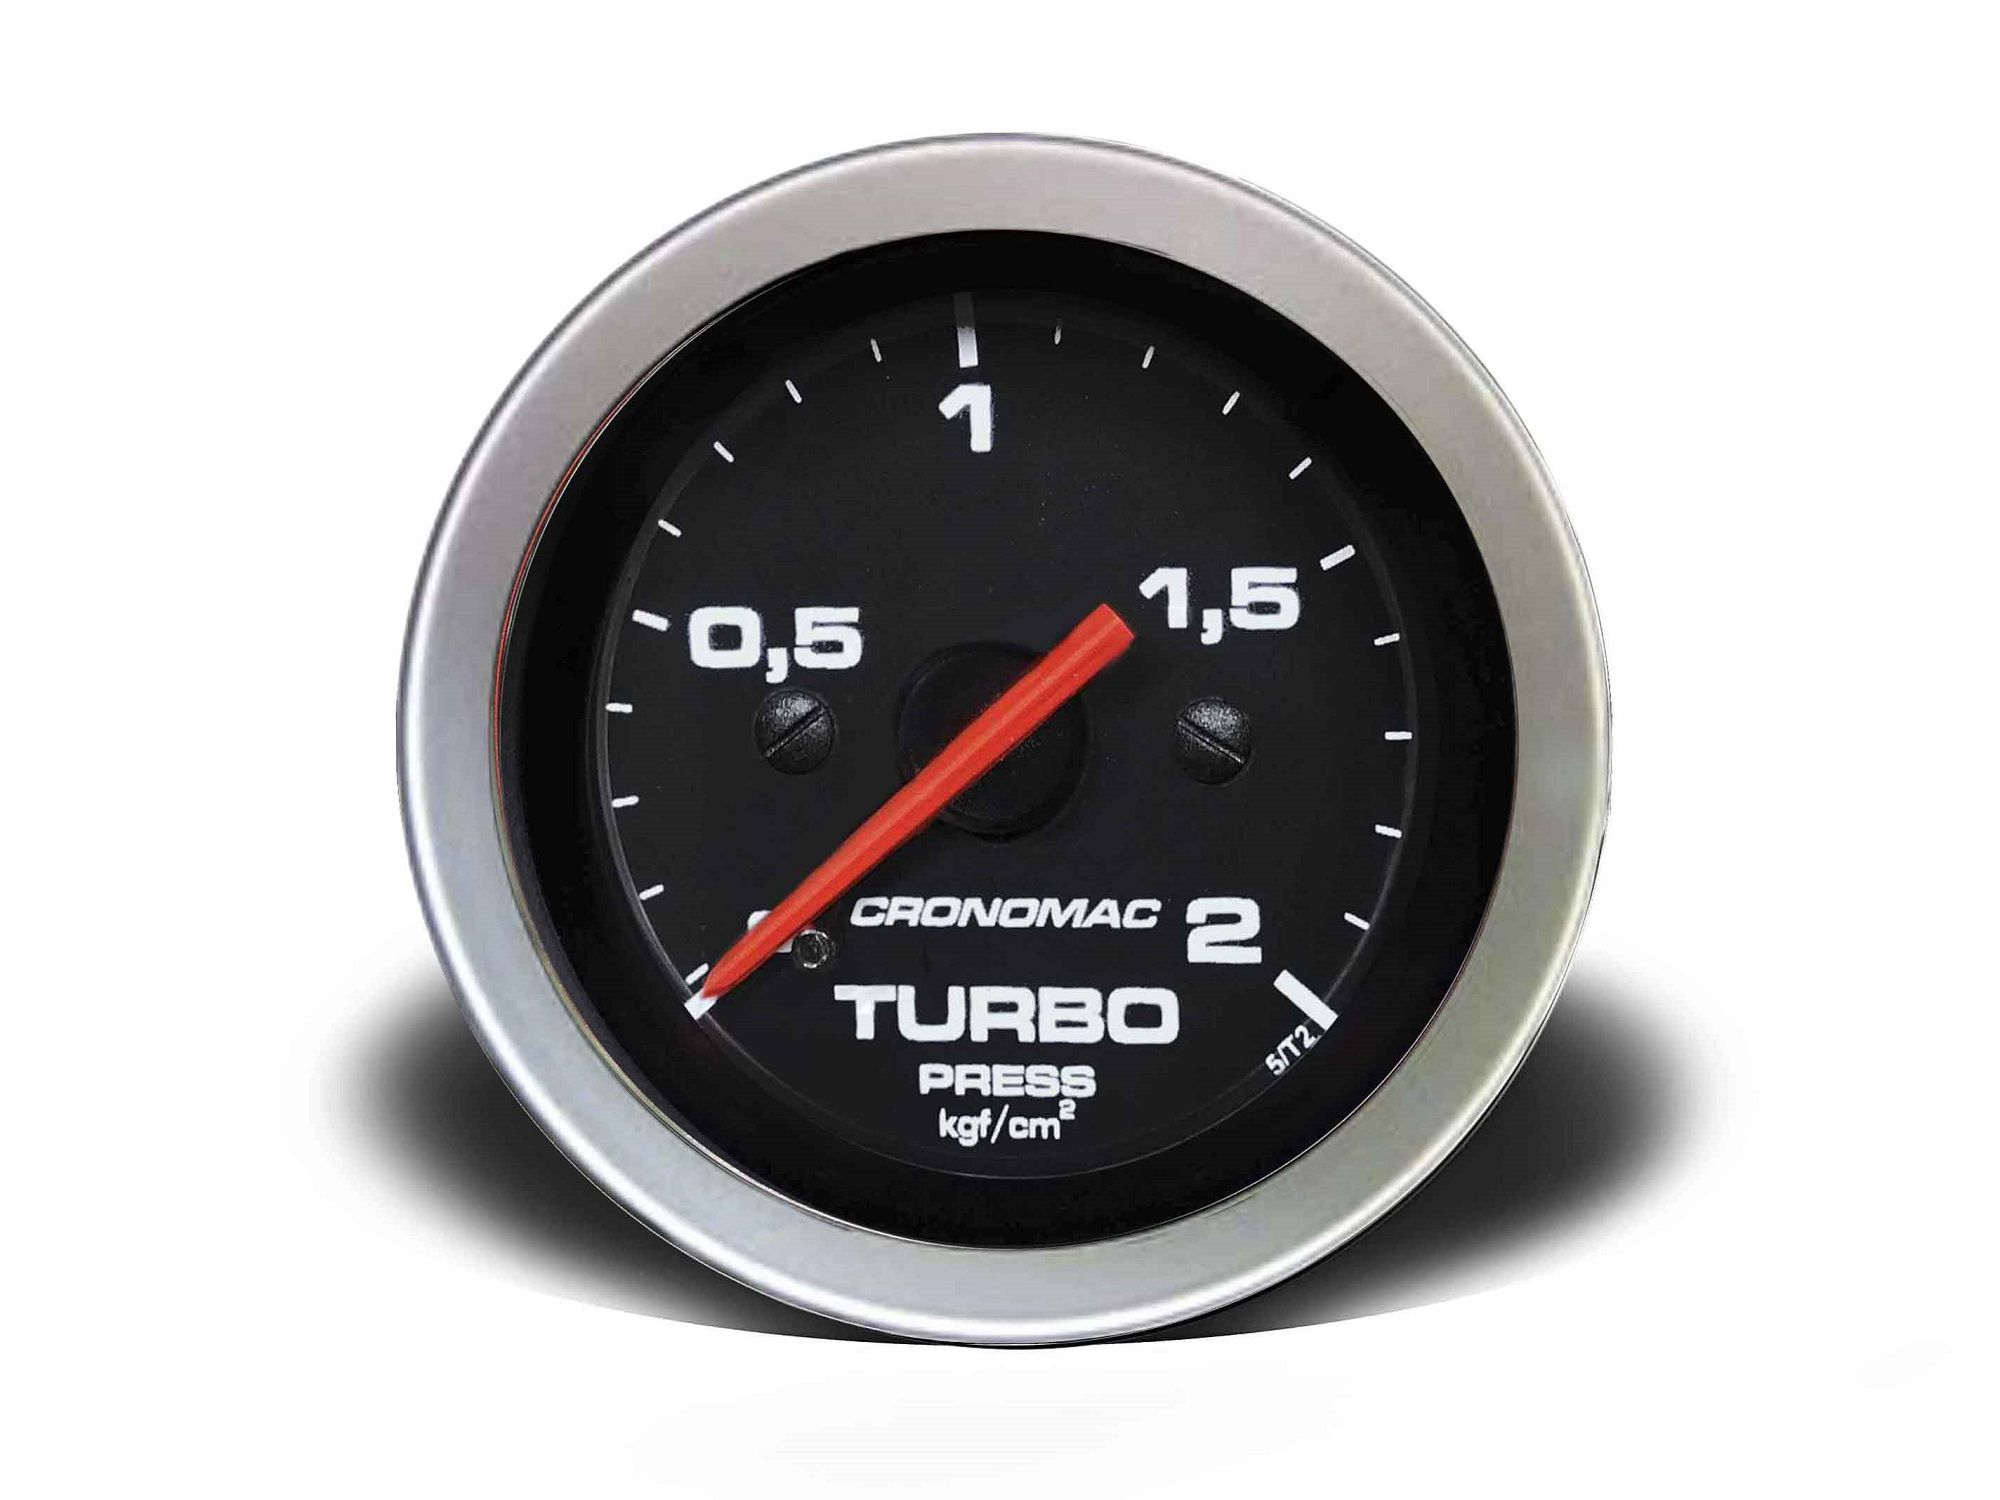 Relogio Pressao de Turbo 2kg Sport 52mm Cronomac